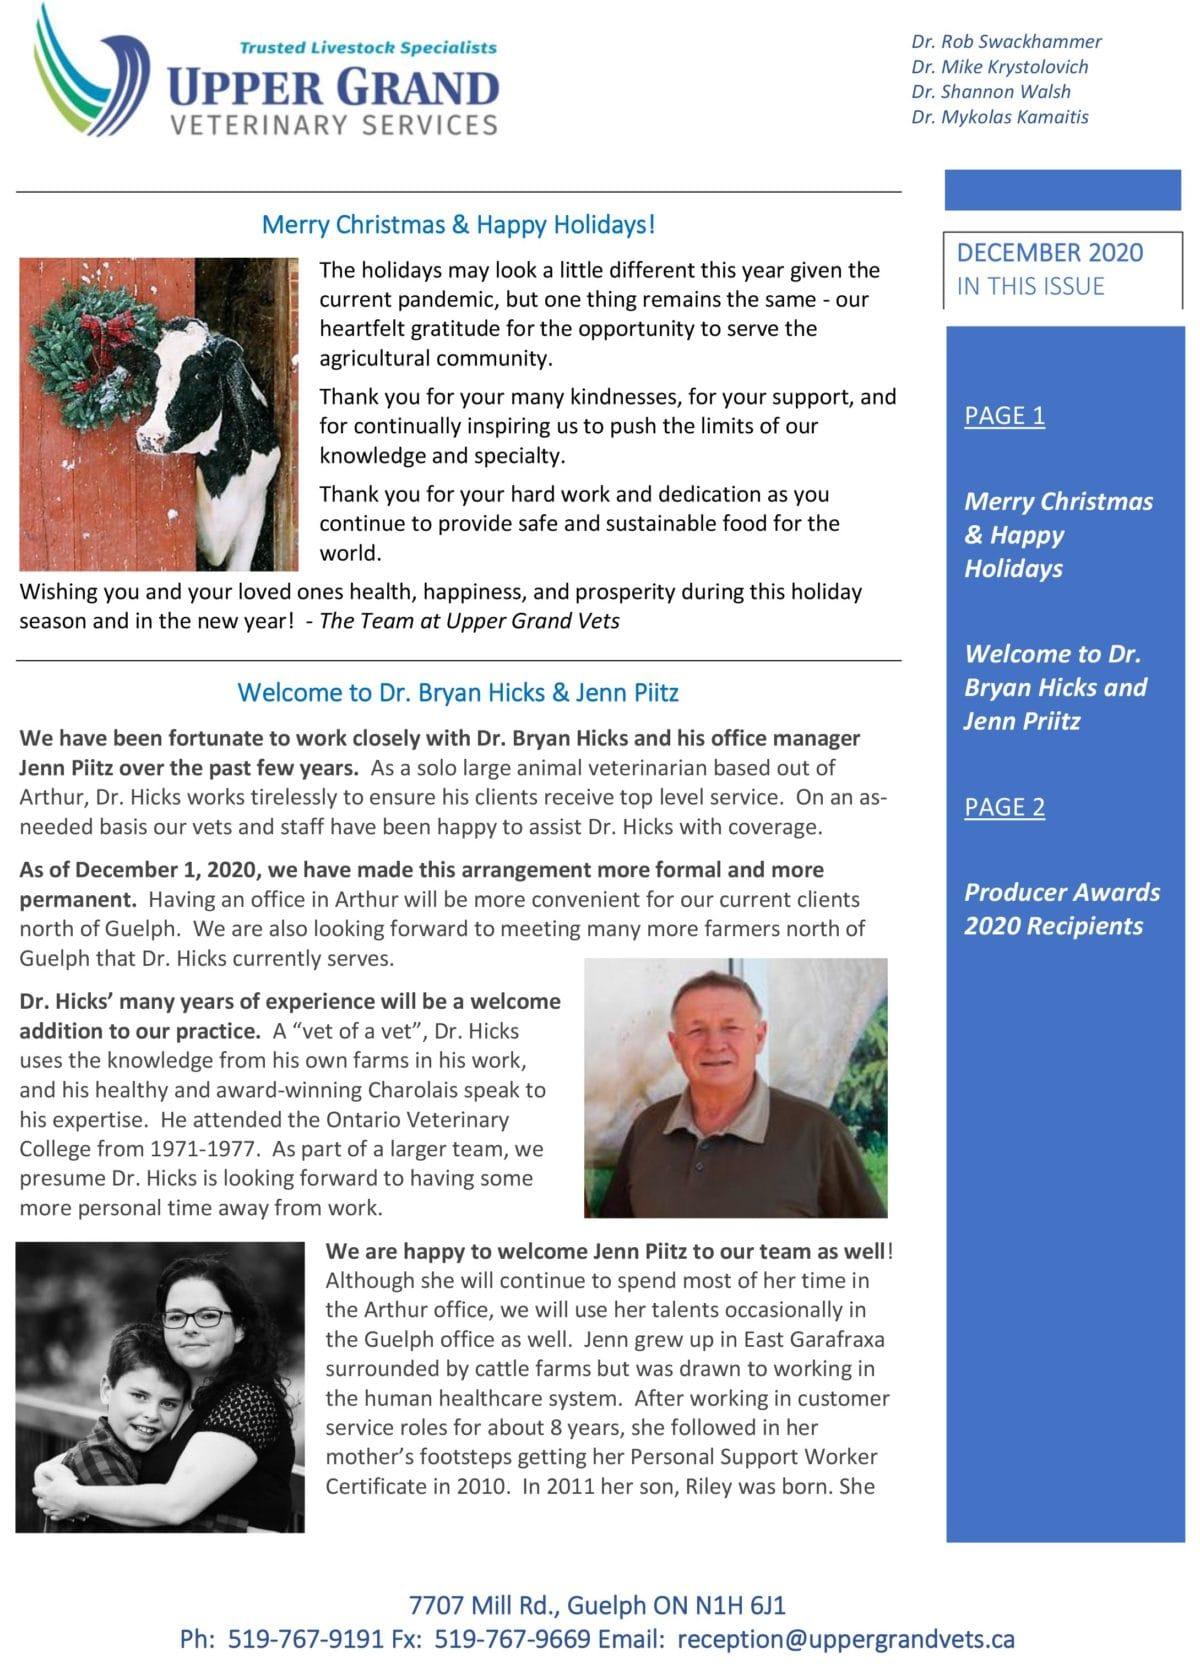 UGVS-12-2020-Newsletter_Dec-2020-1-copy-1200x1664.jpg